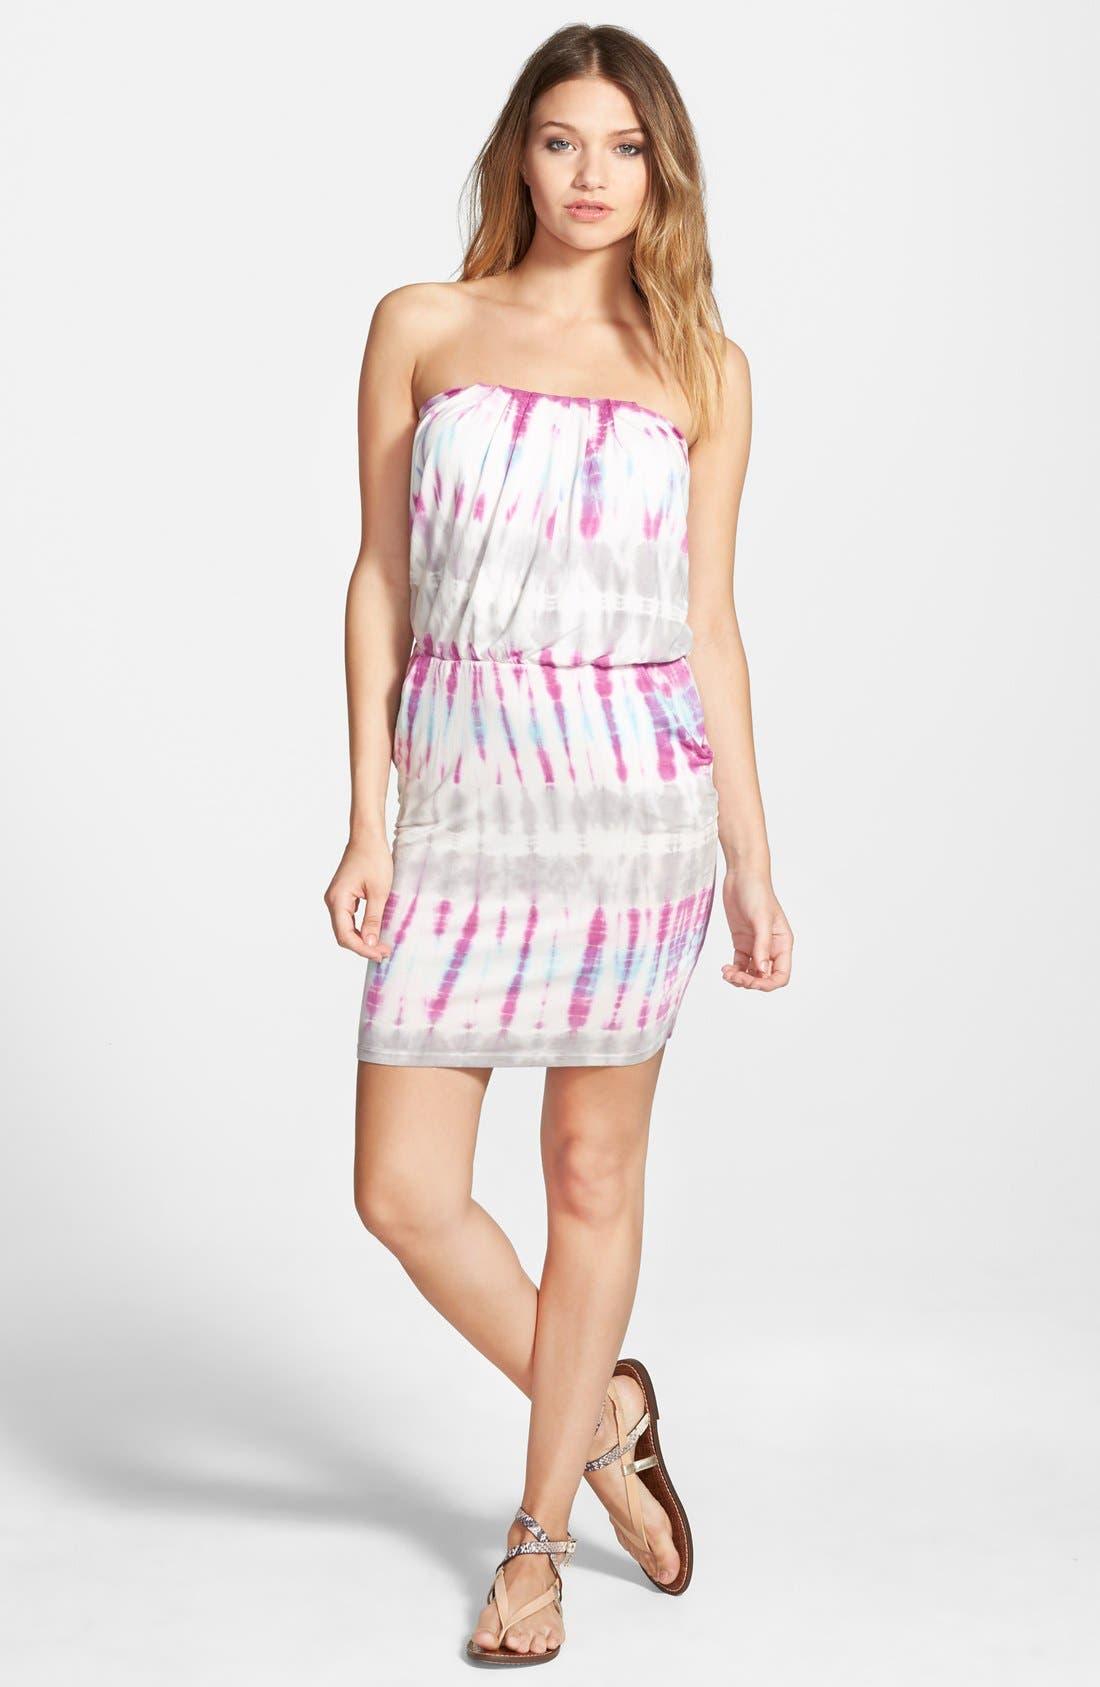 Alternate Image 1 Selected - Young, Fabulous & Broke 'Freya' Strapless Tie Dye Dress